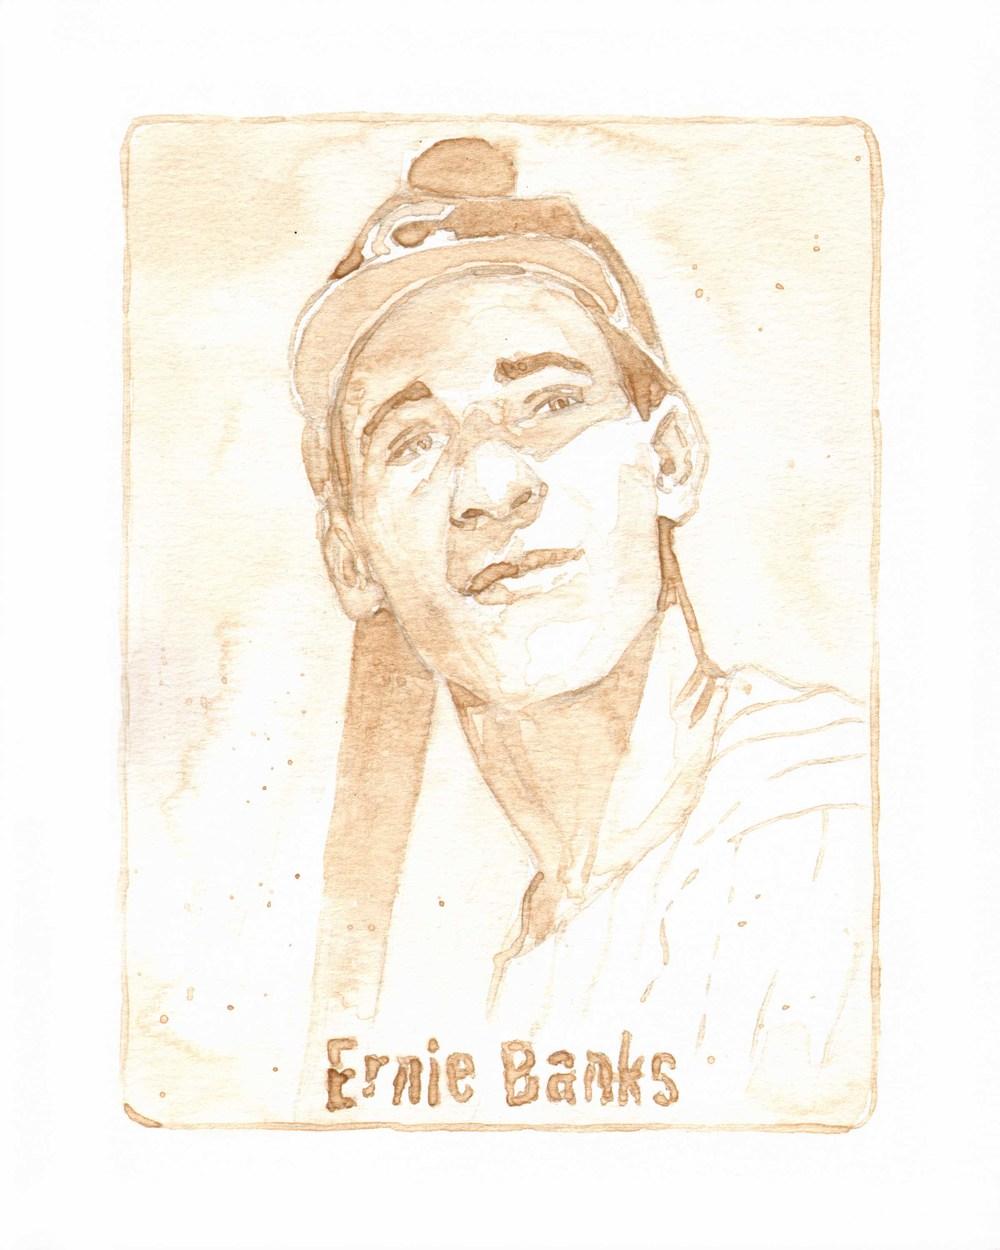 Ernie Banks 8x10.jpg